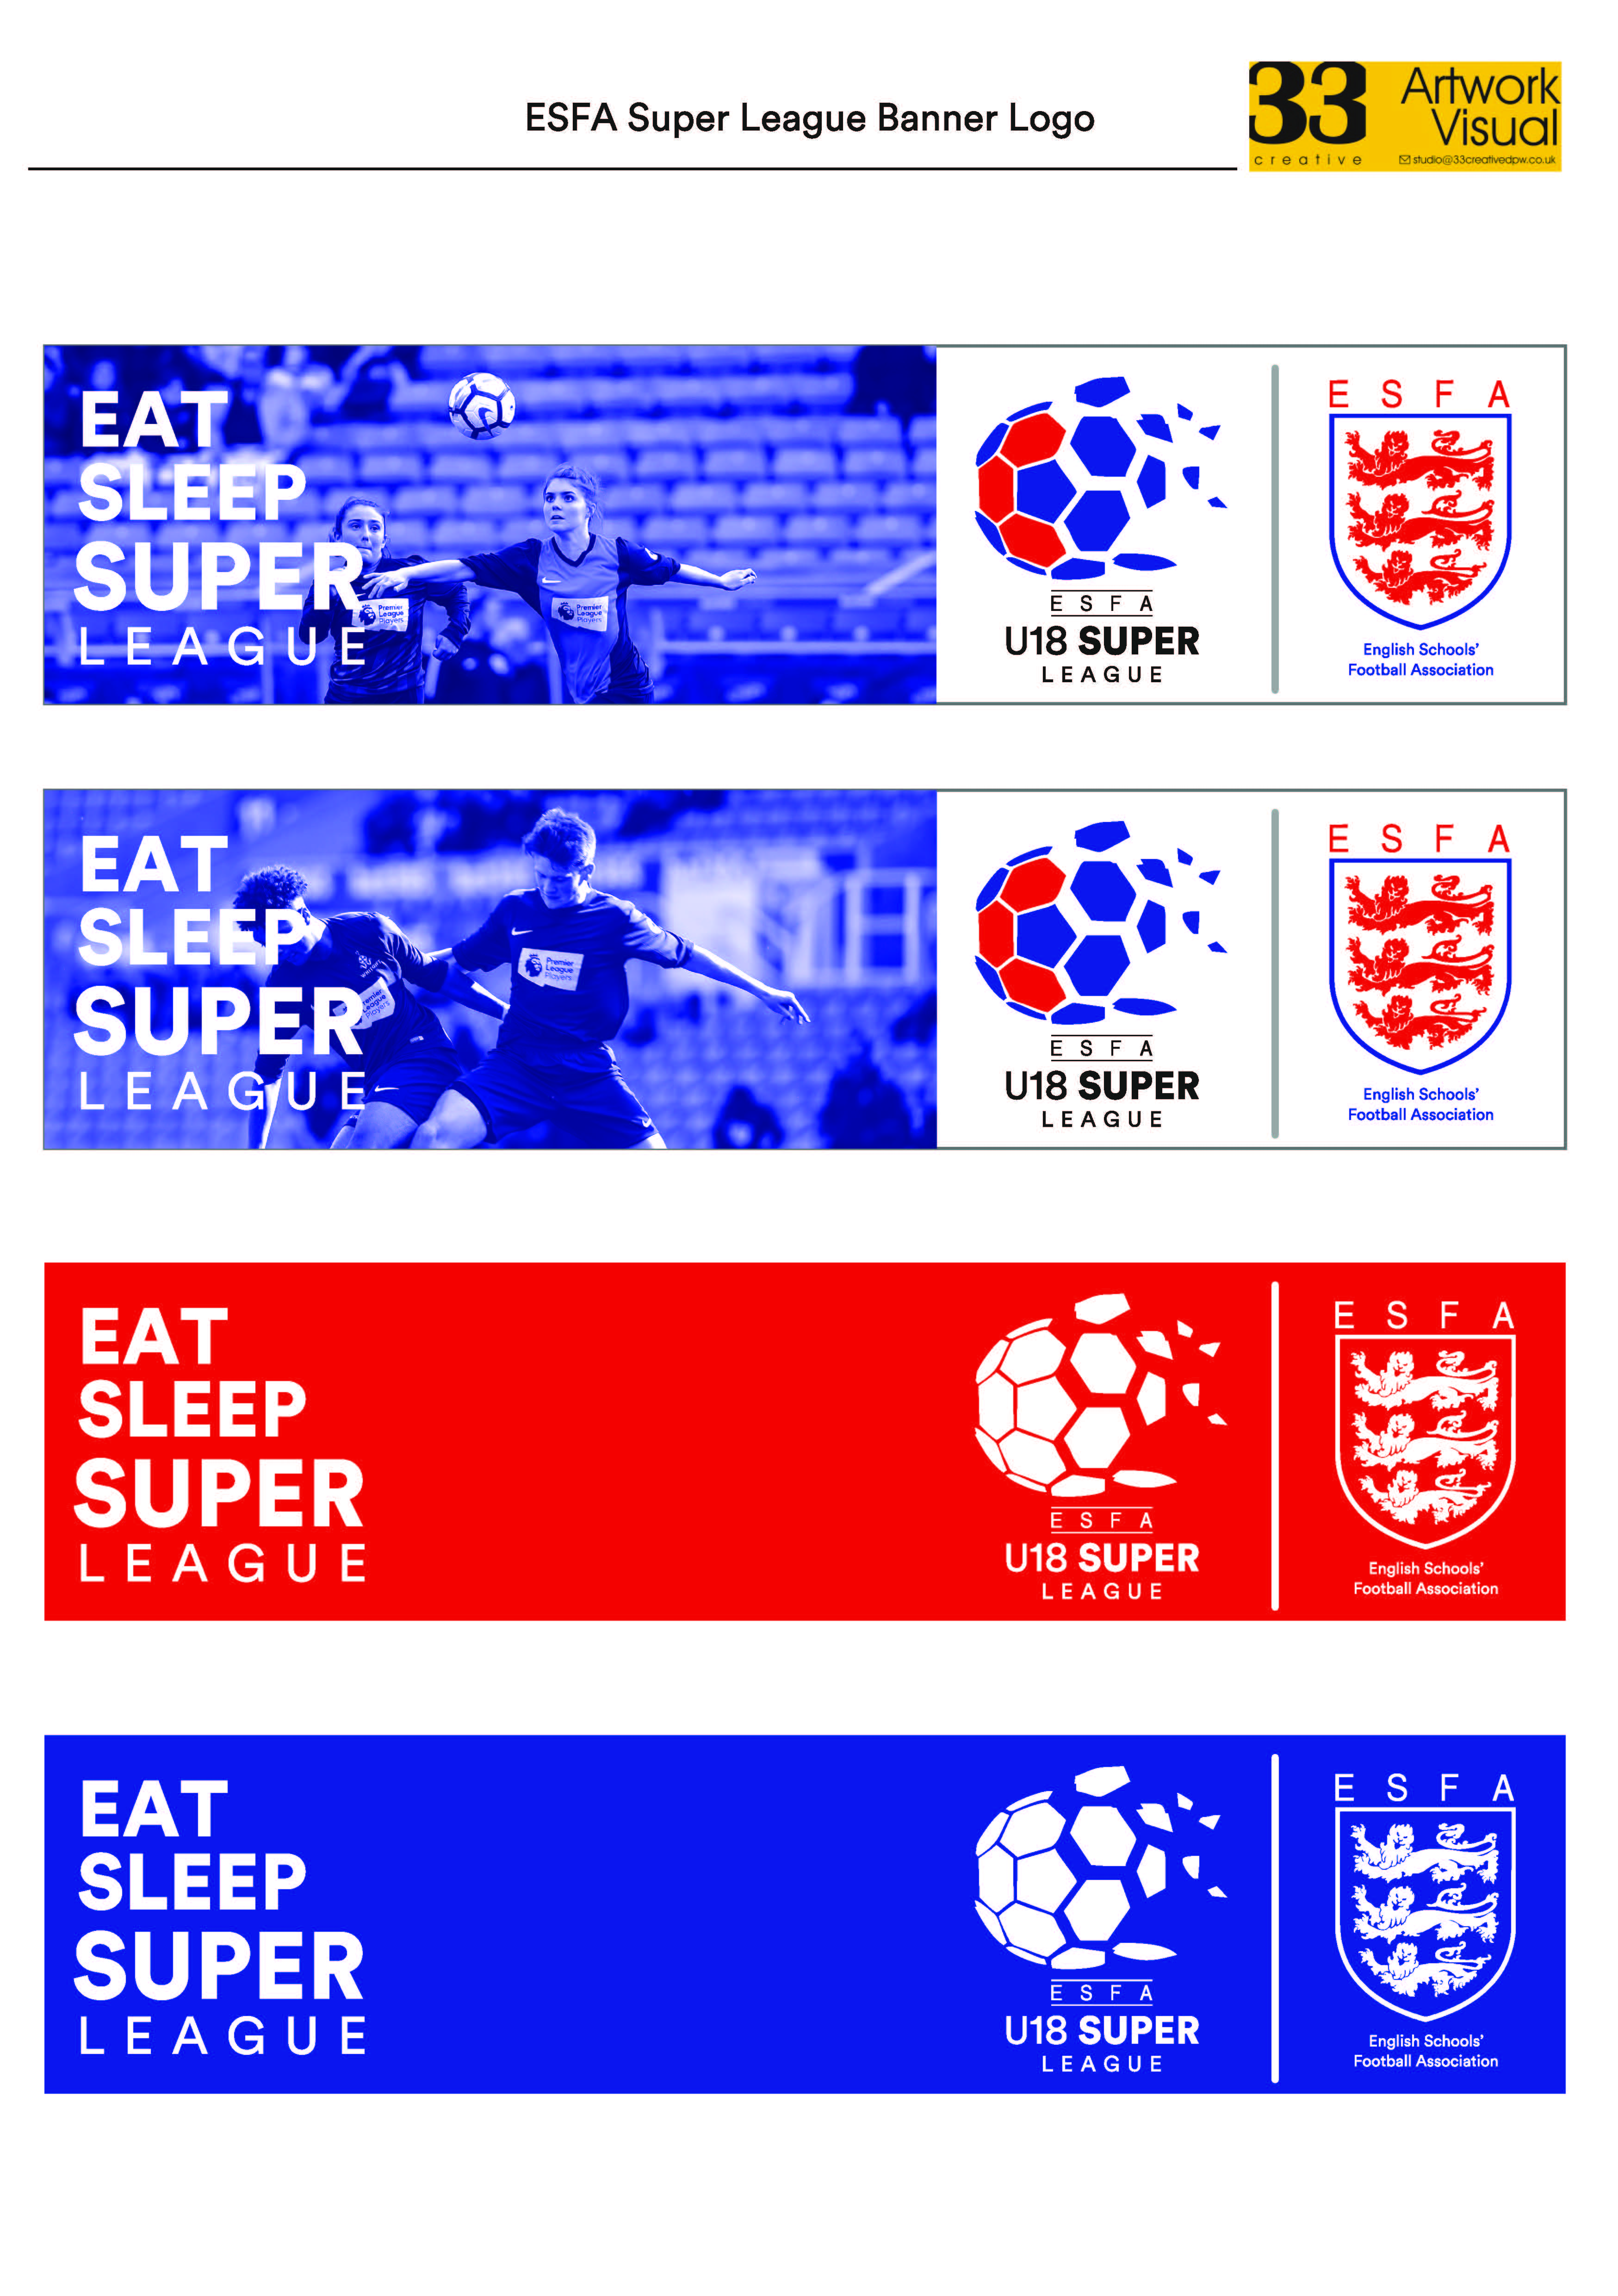 ESFA Super League brand_Page_4